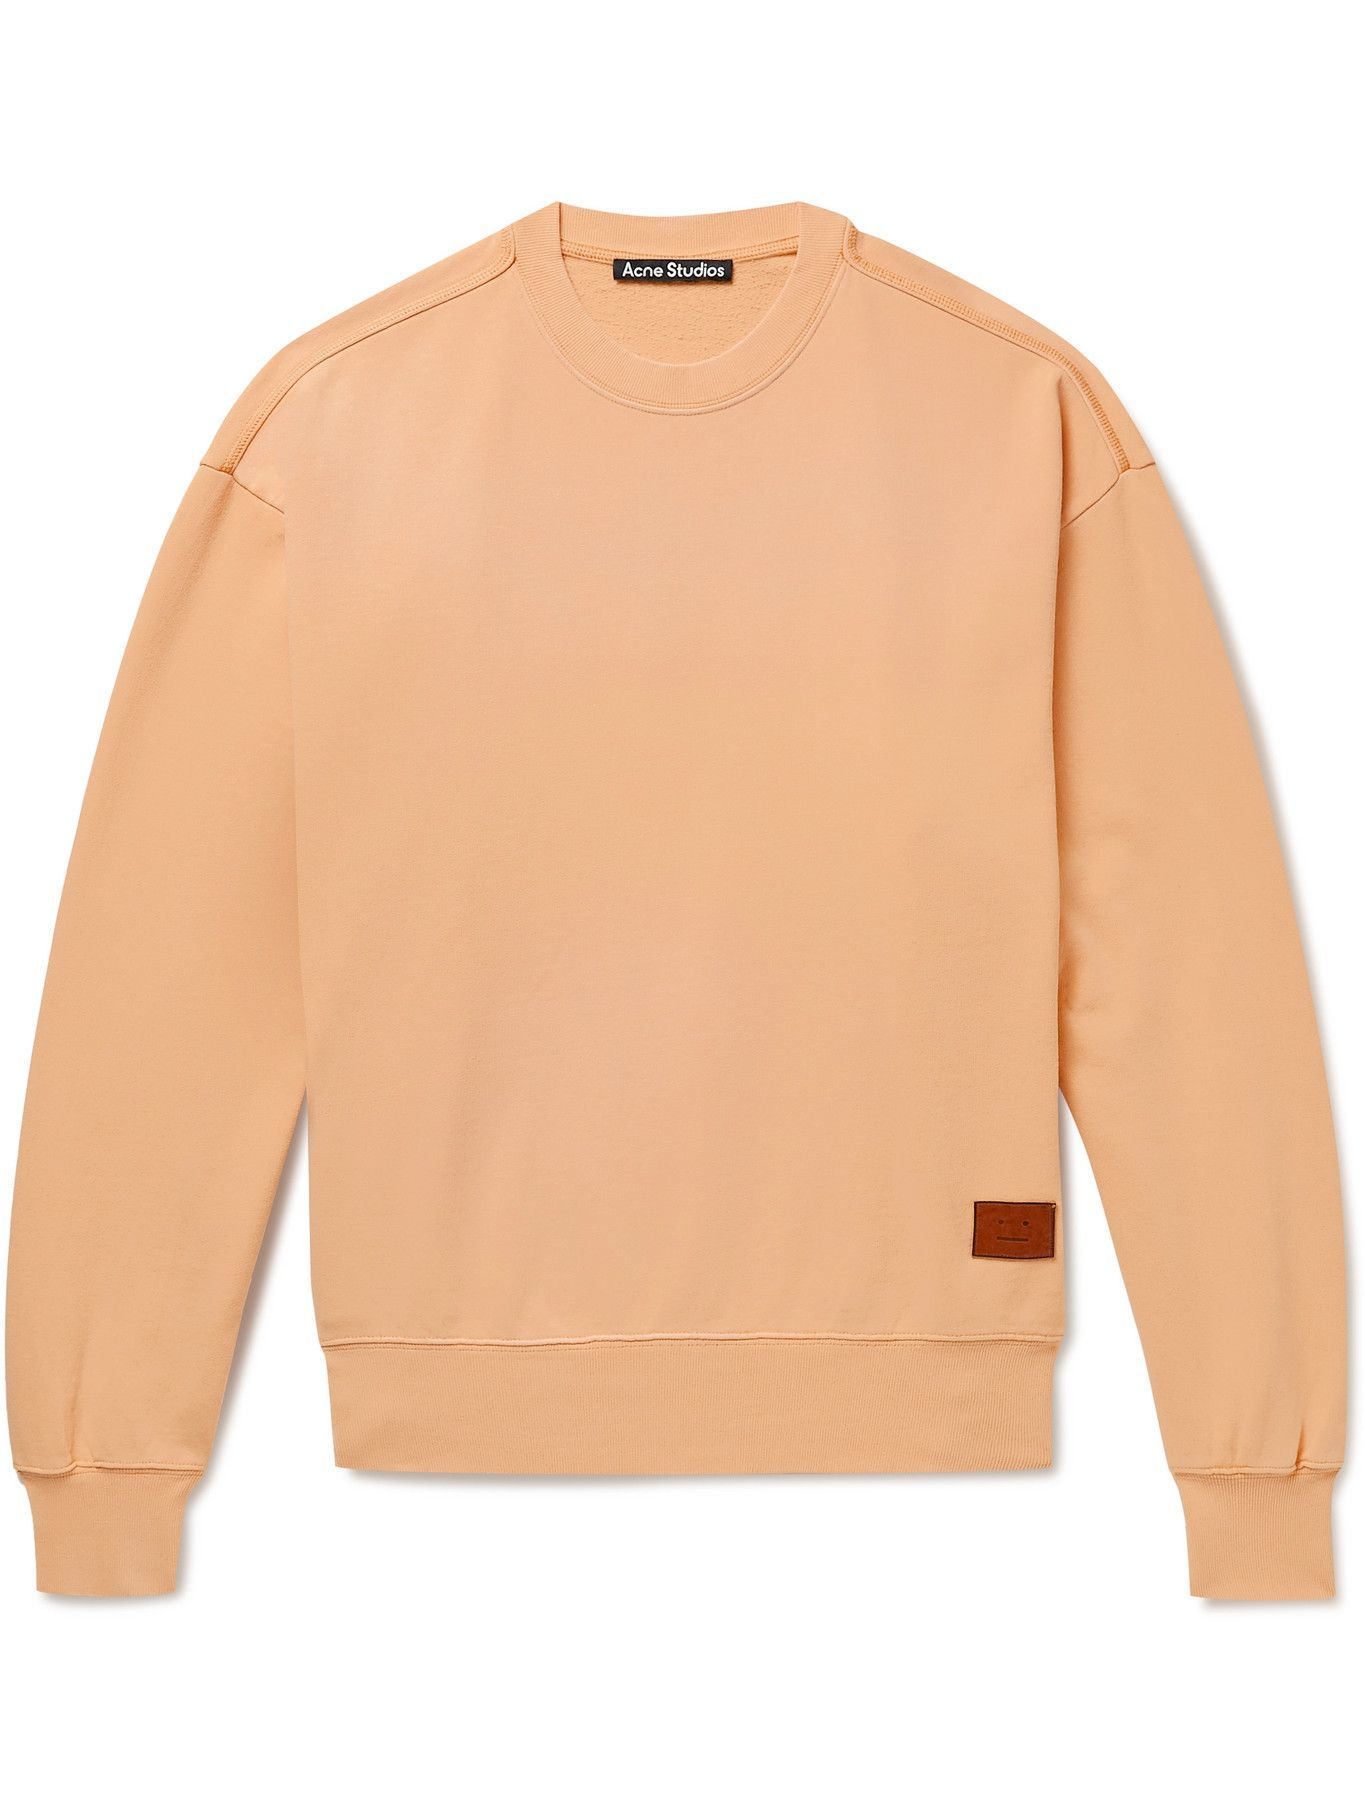 Photo: Acne Studios - Fiah Logo-Appliquéd Printed Cotton-Jersey Sweatshirt - Orange